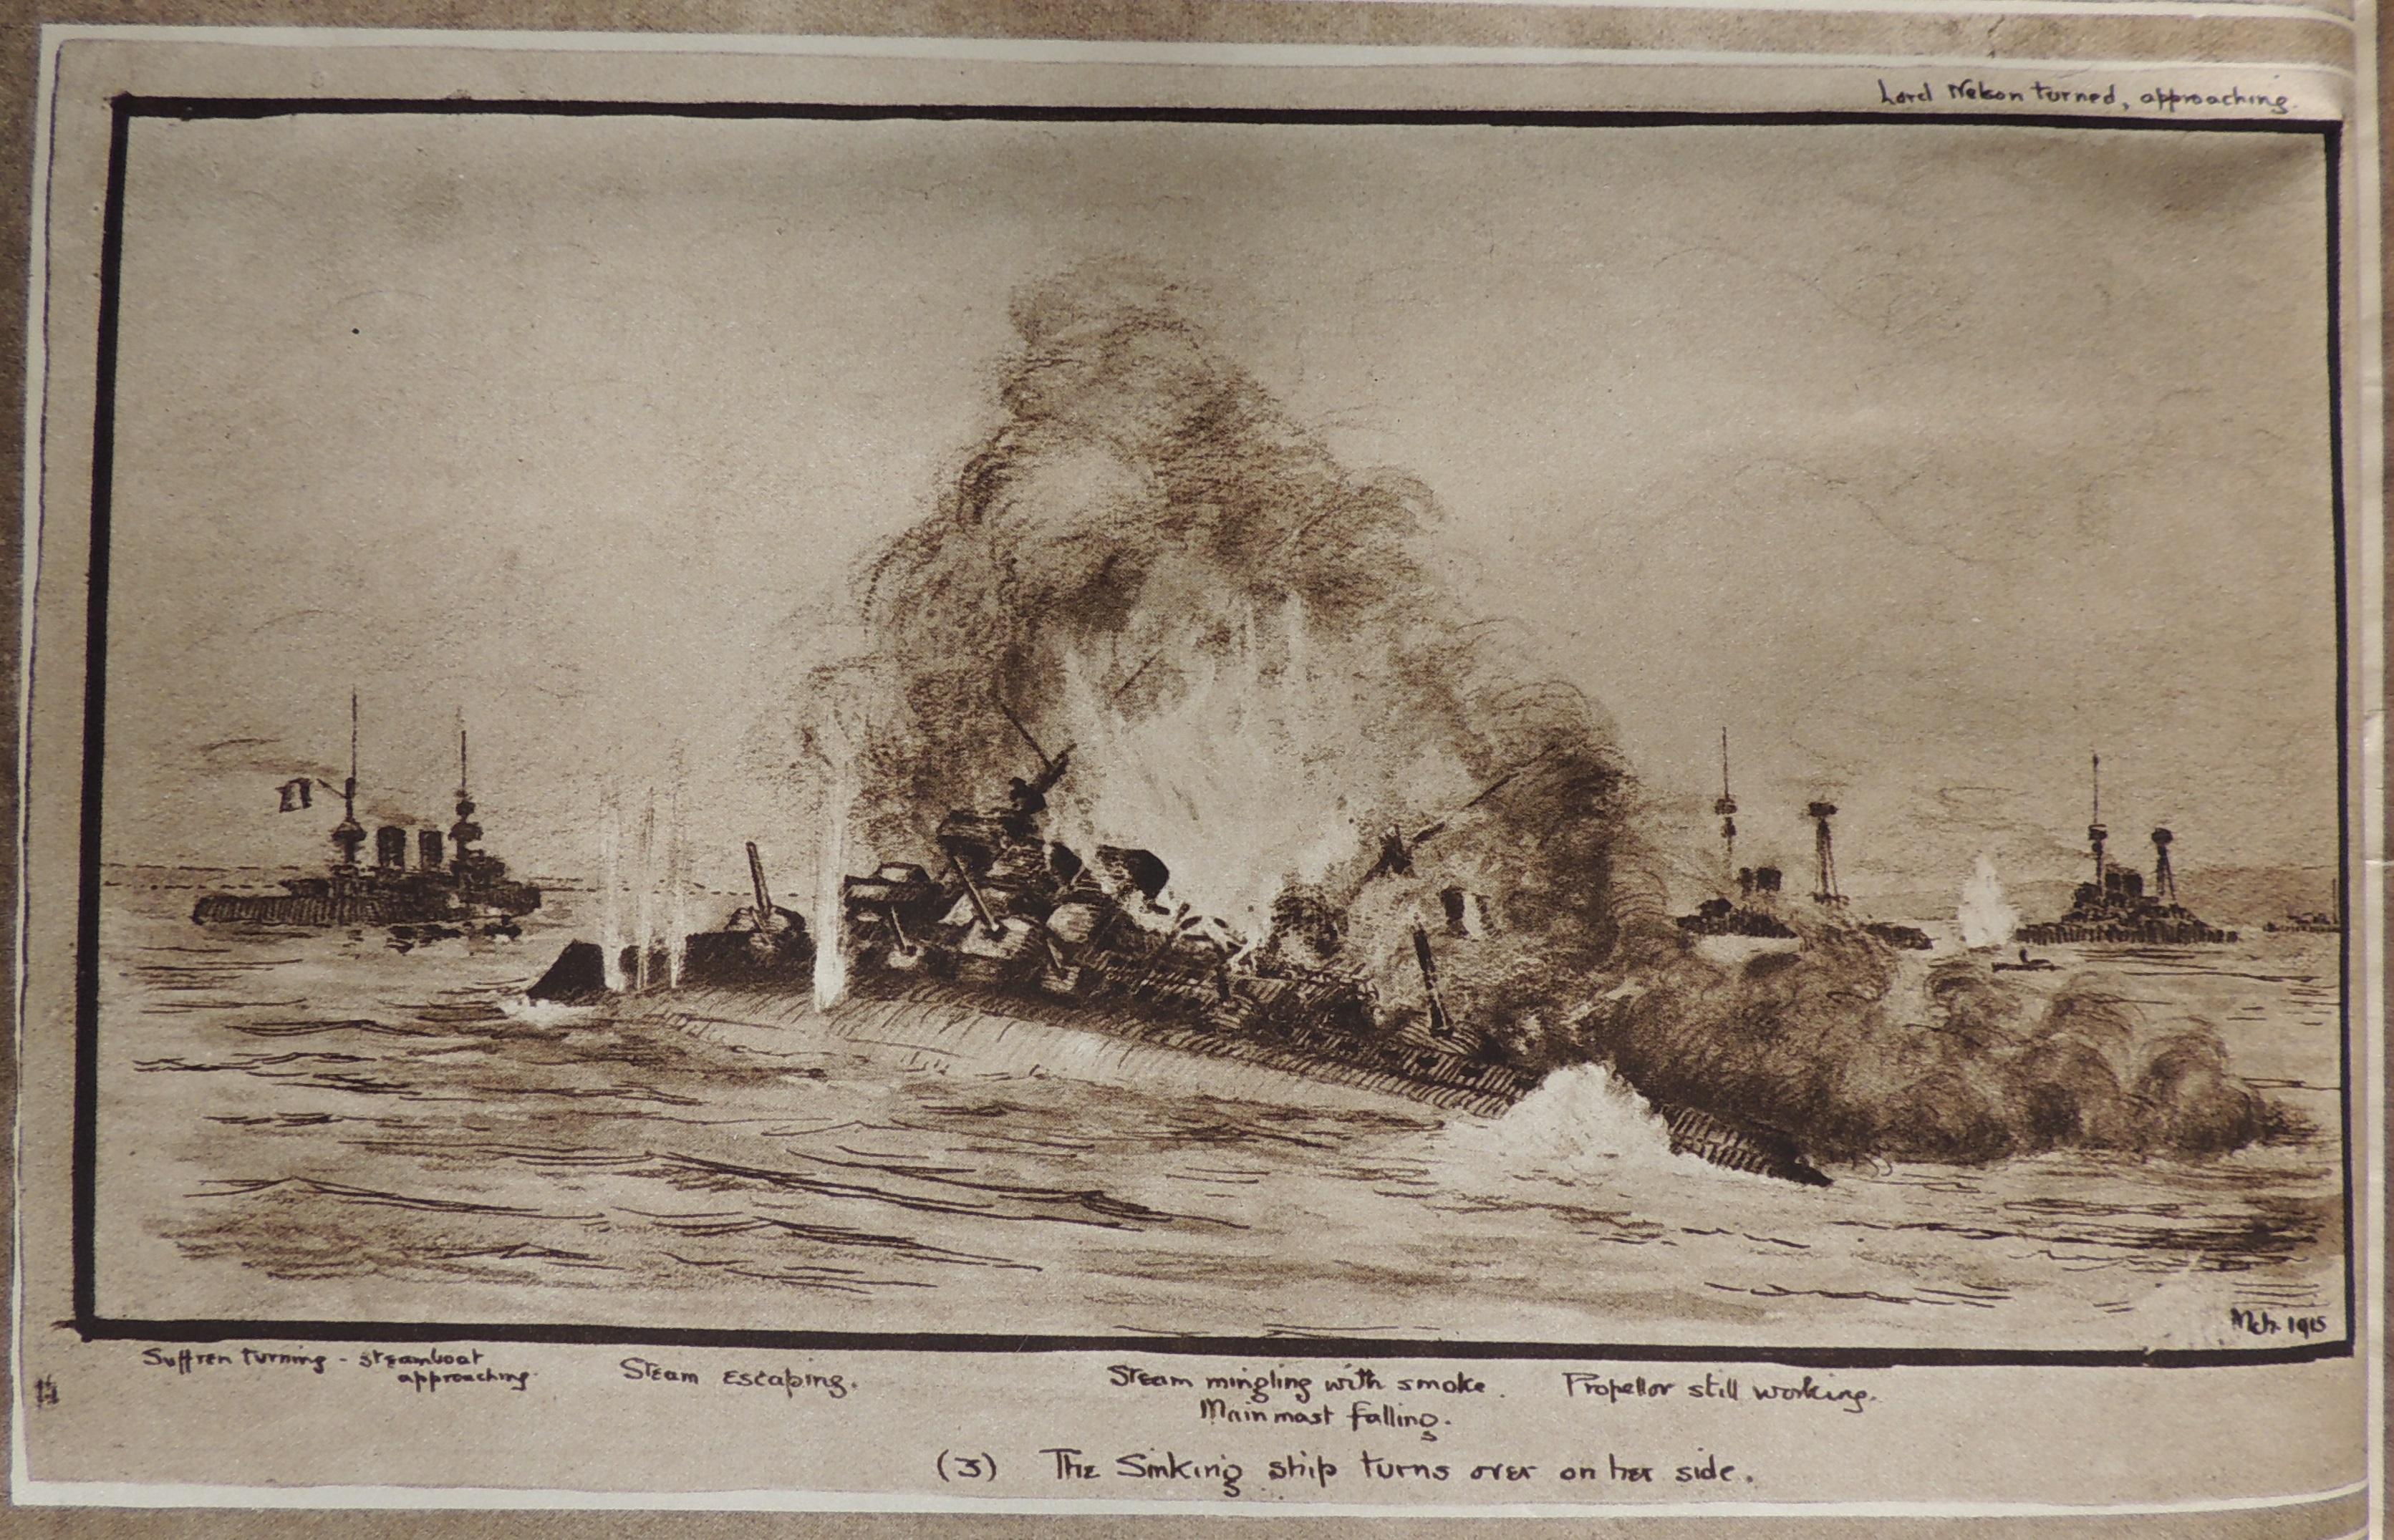 Bouvet dessin 3 illustrated london news 17 avril 1915LR